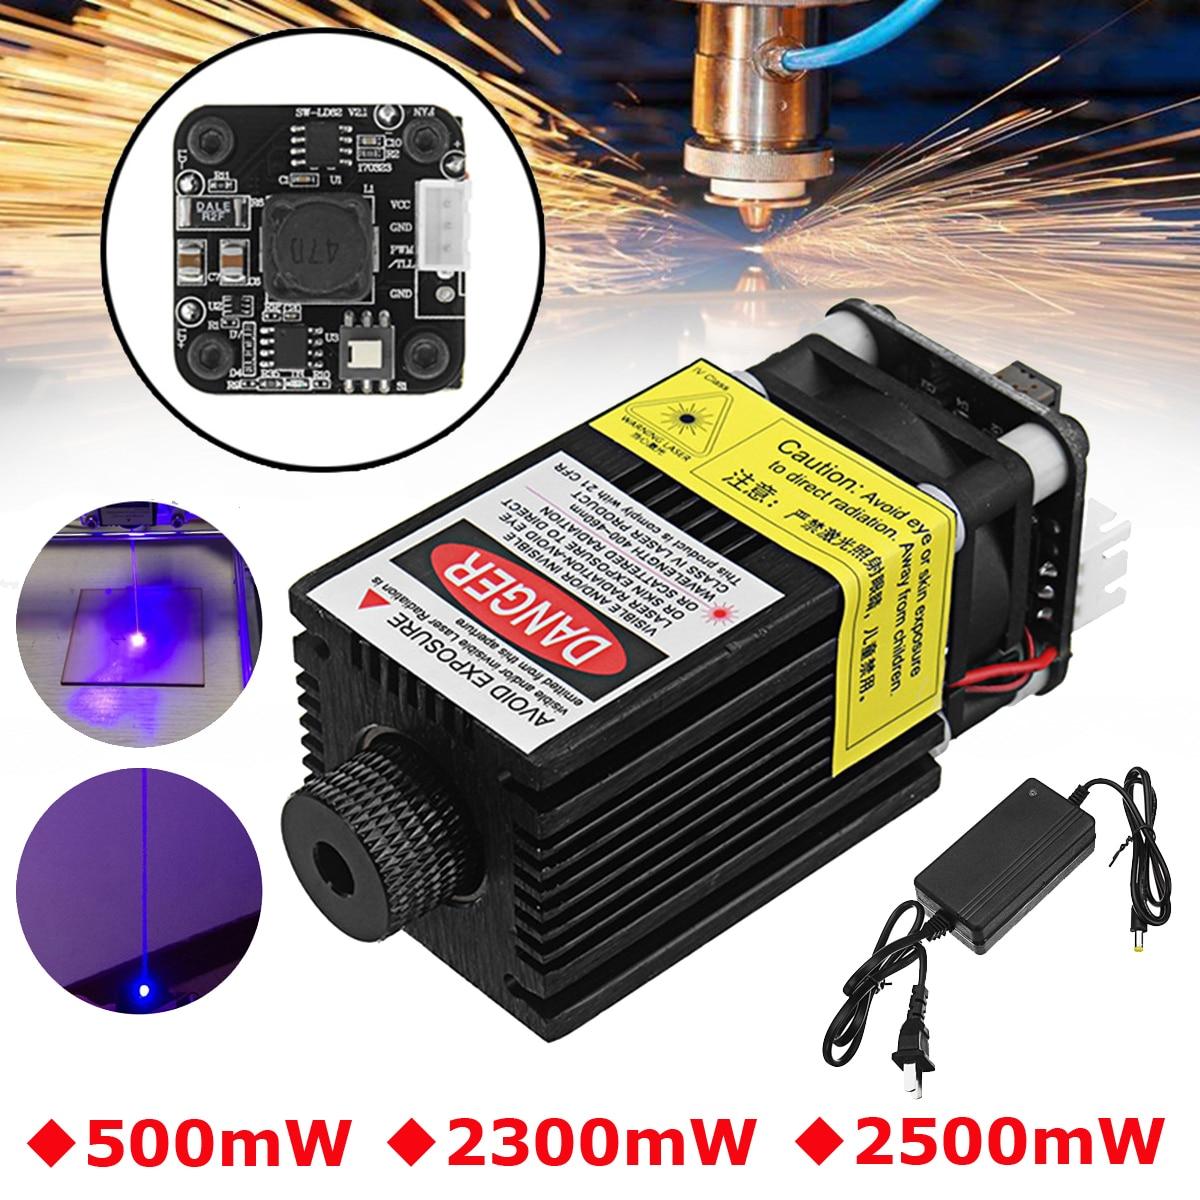 500/2300/2500mW EleksMaker 405-445NM Blue Laser Module 2.54-3P TTL/PWM Modulation For DIY Laser Engraver galaxy s7 edge geekbench